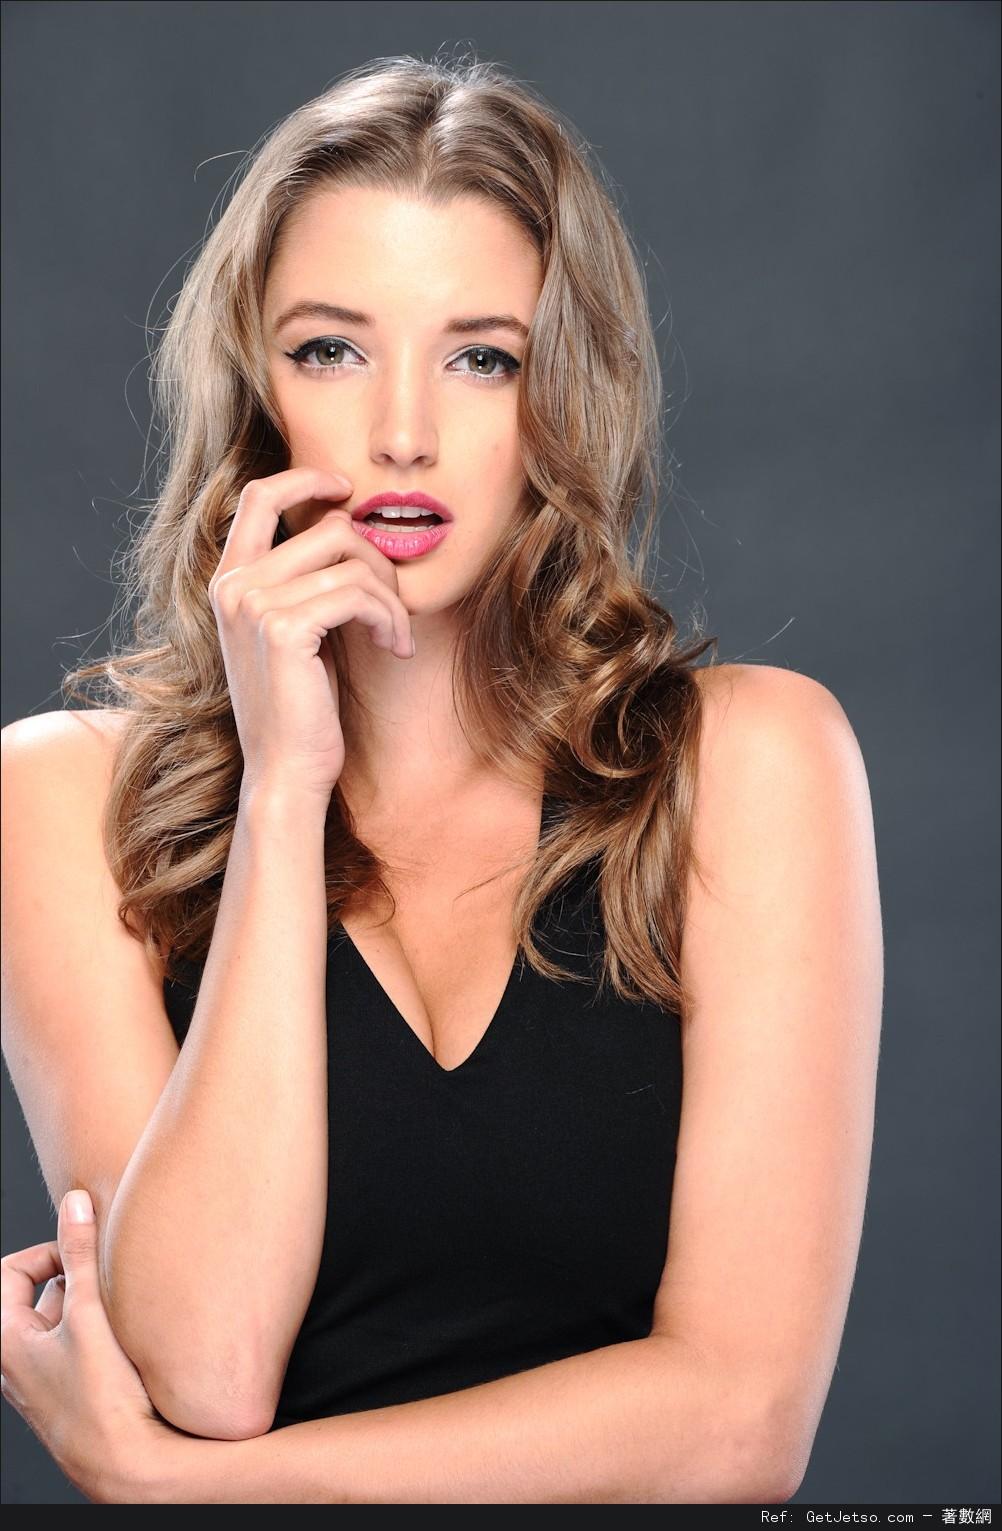 Playboy girl - Alyssa Arce寫真照片 - Get Jetso 著數優惠網